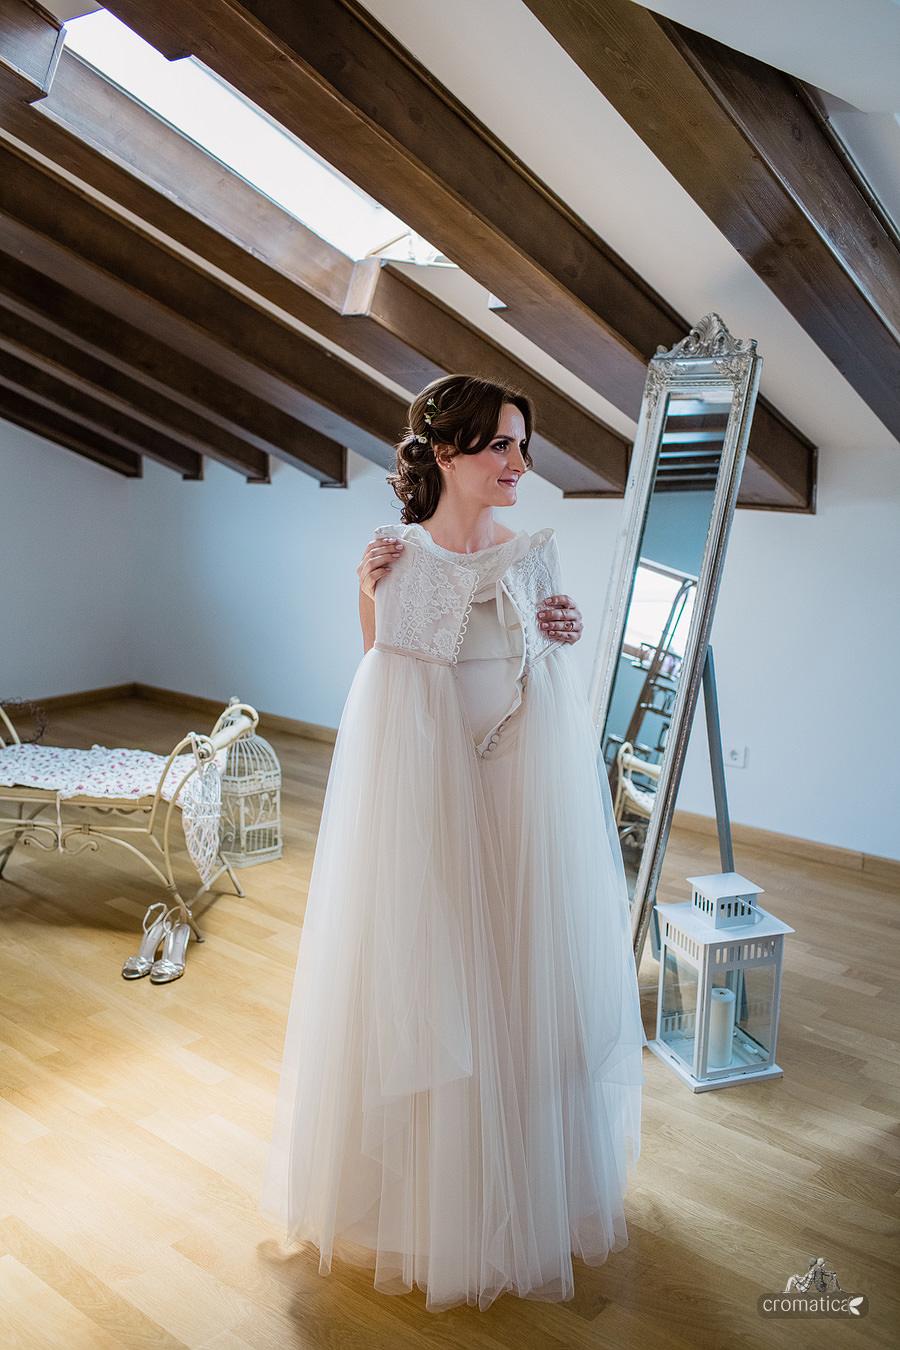 Carla + Dragos - Fotografii nunta Bucuresti (10)